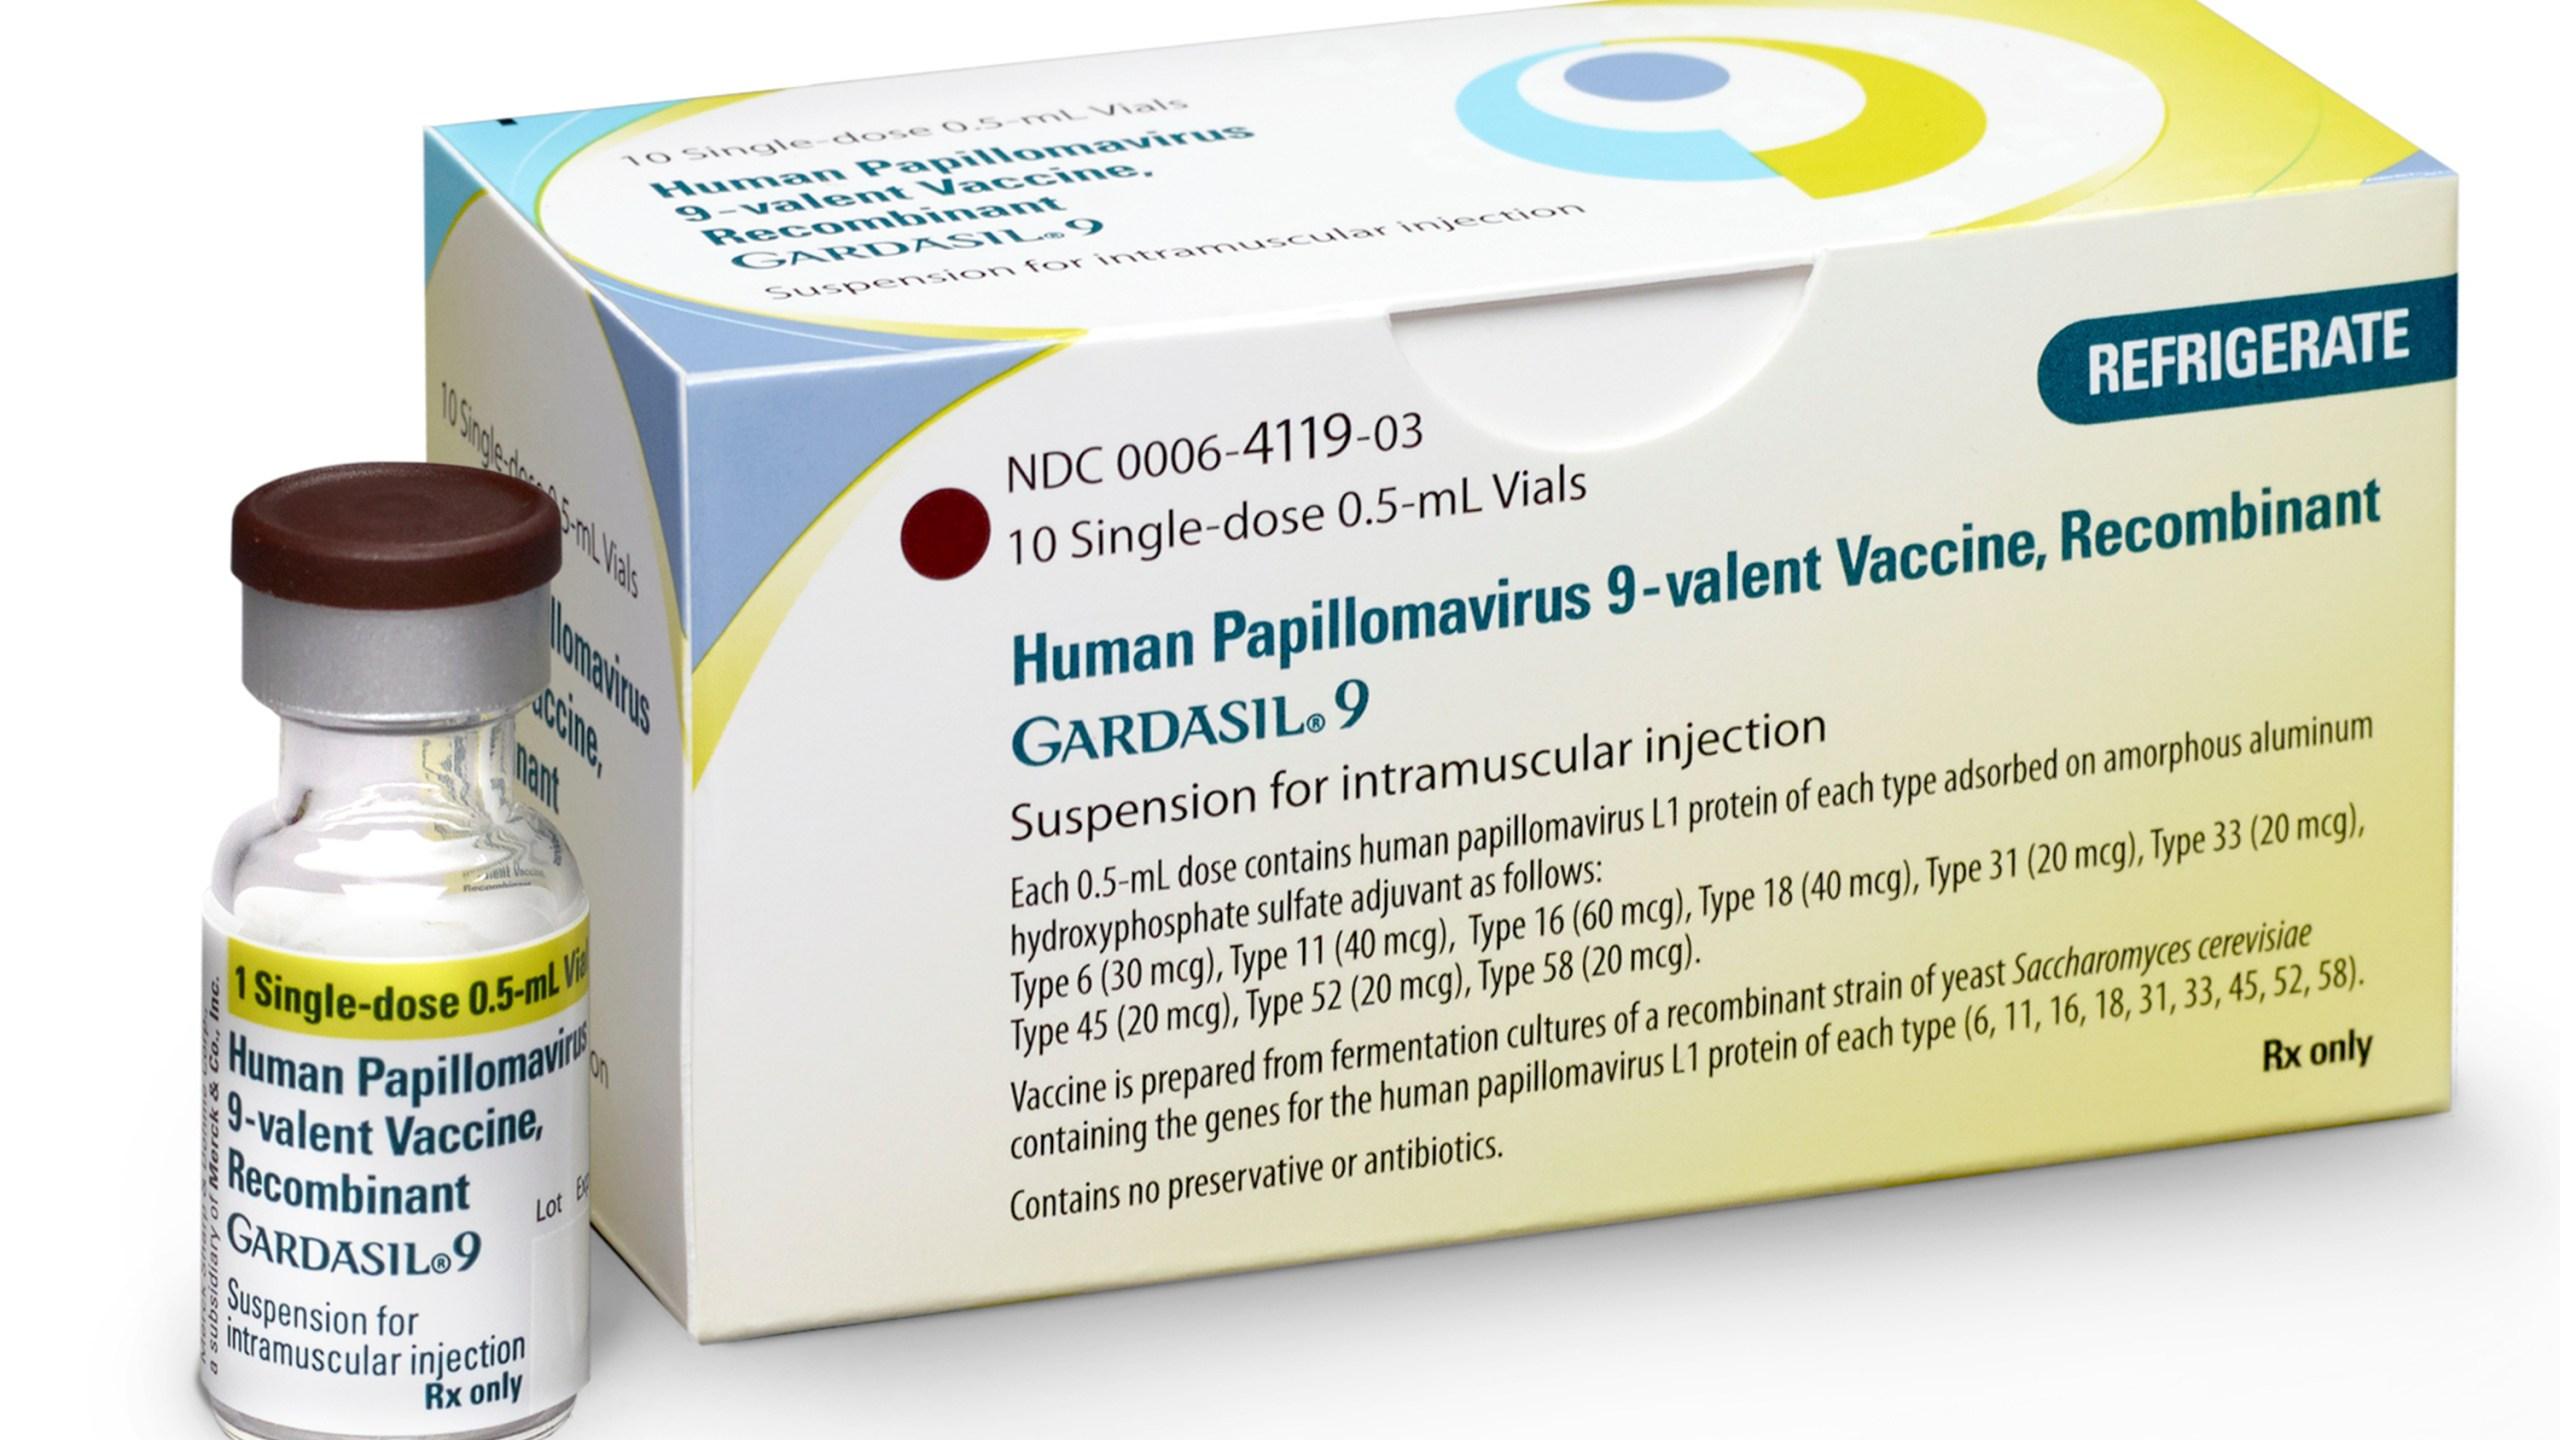 FDA_HPV_Vaccine_19073-159532.jpg49155595